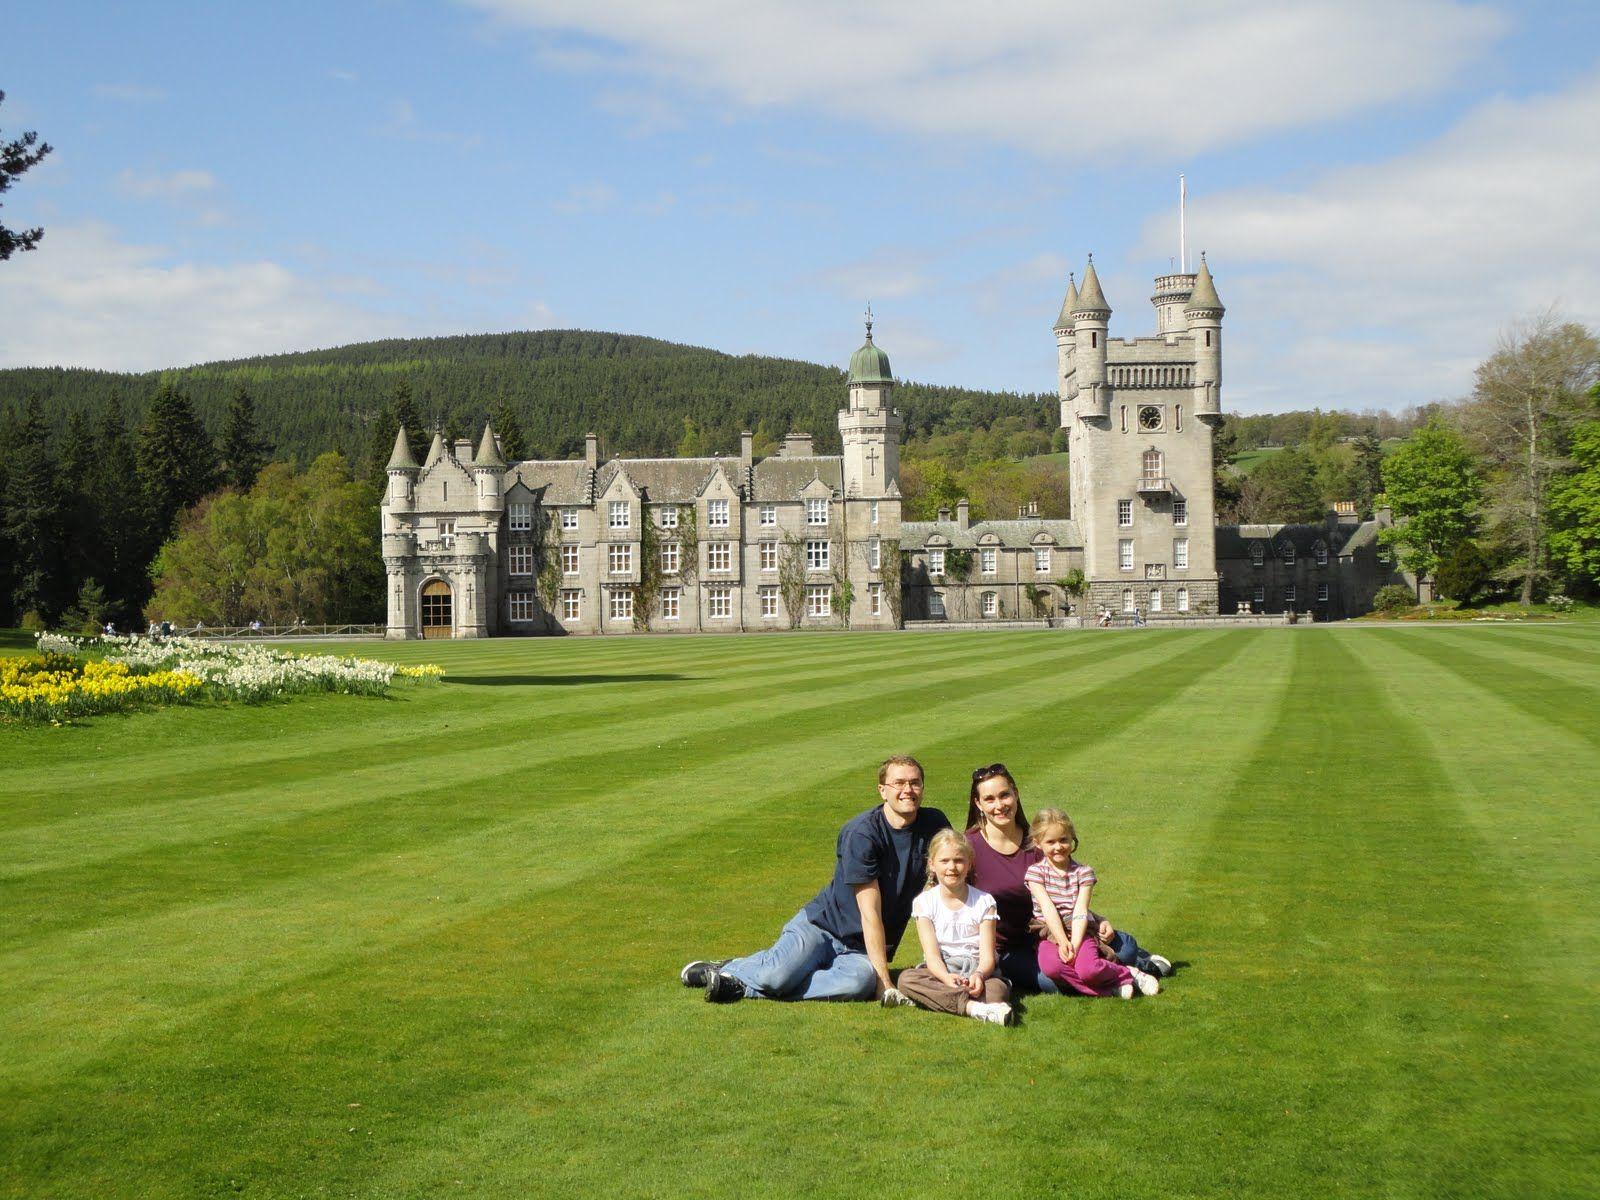 7. Balmoral Castle